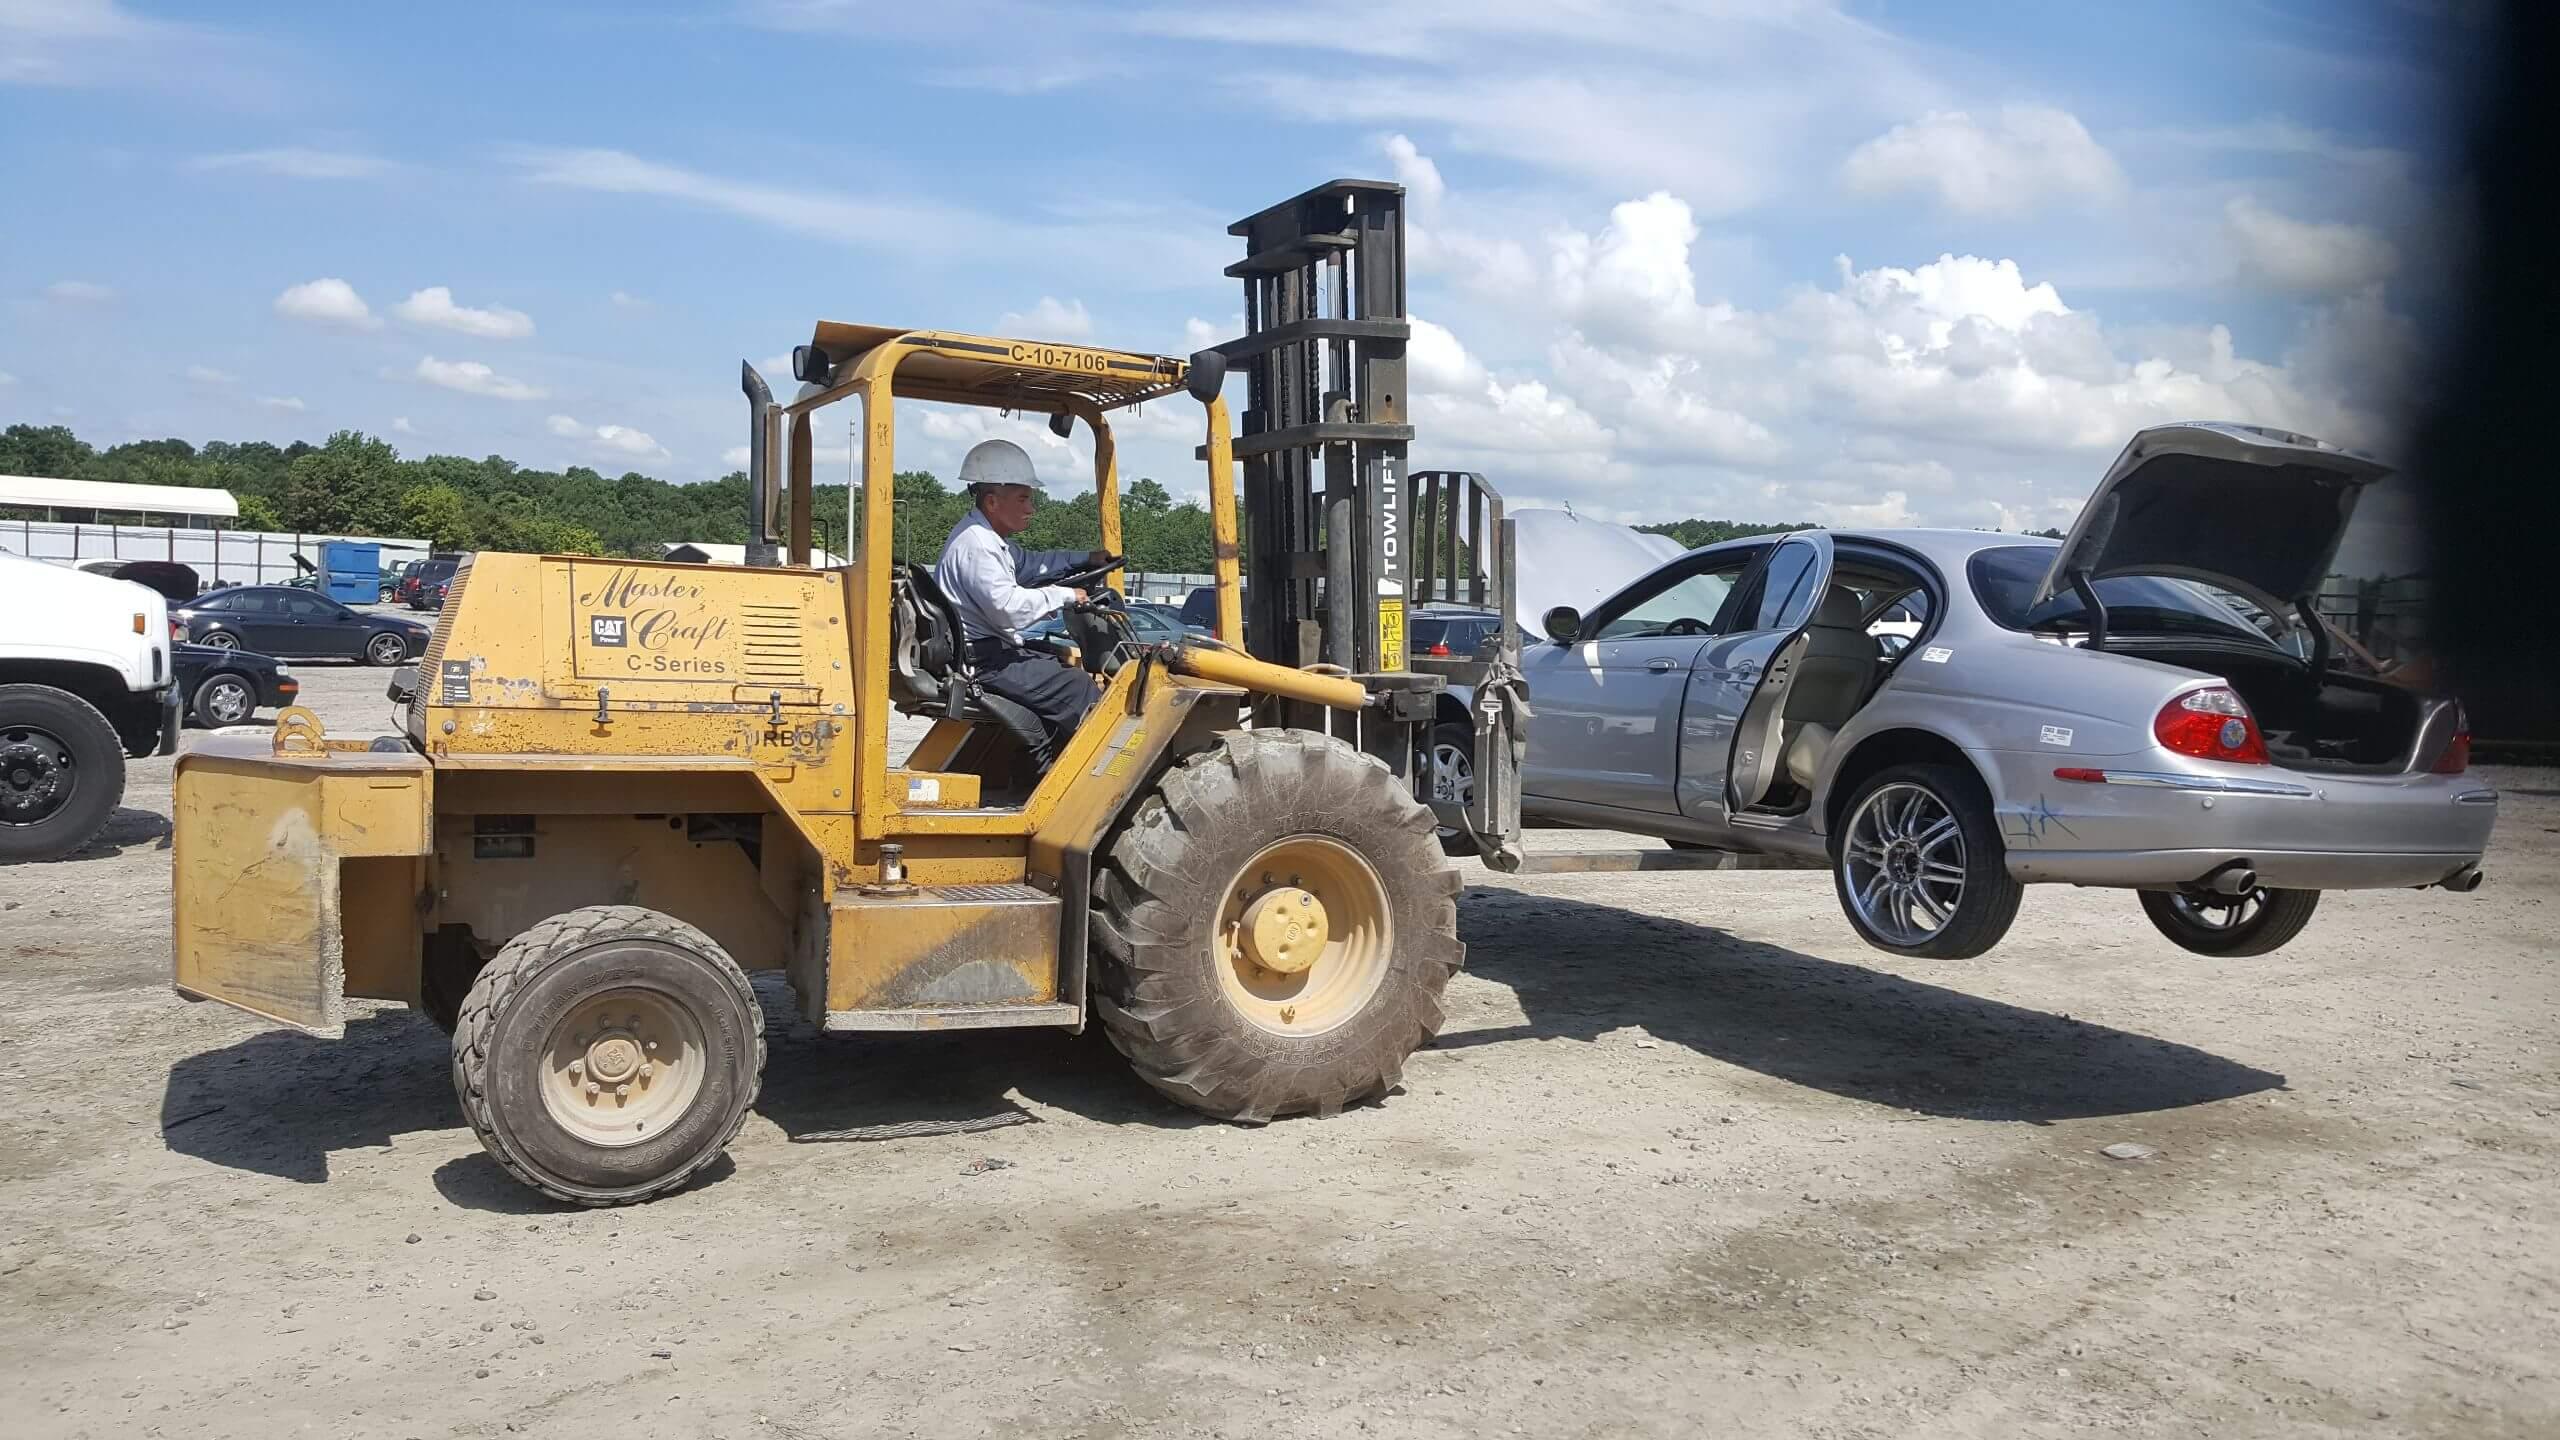 Car Crushers Cash For Junk Cars Acworth Ga W/o Titles 404*399*3474